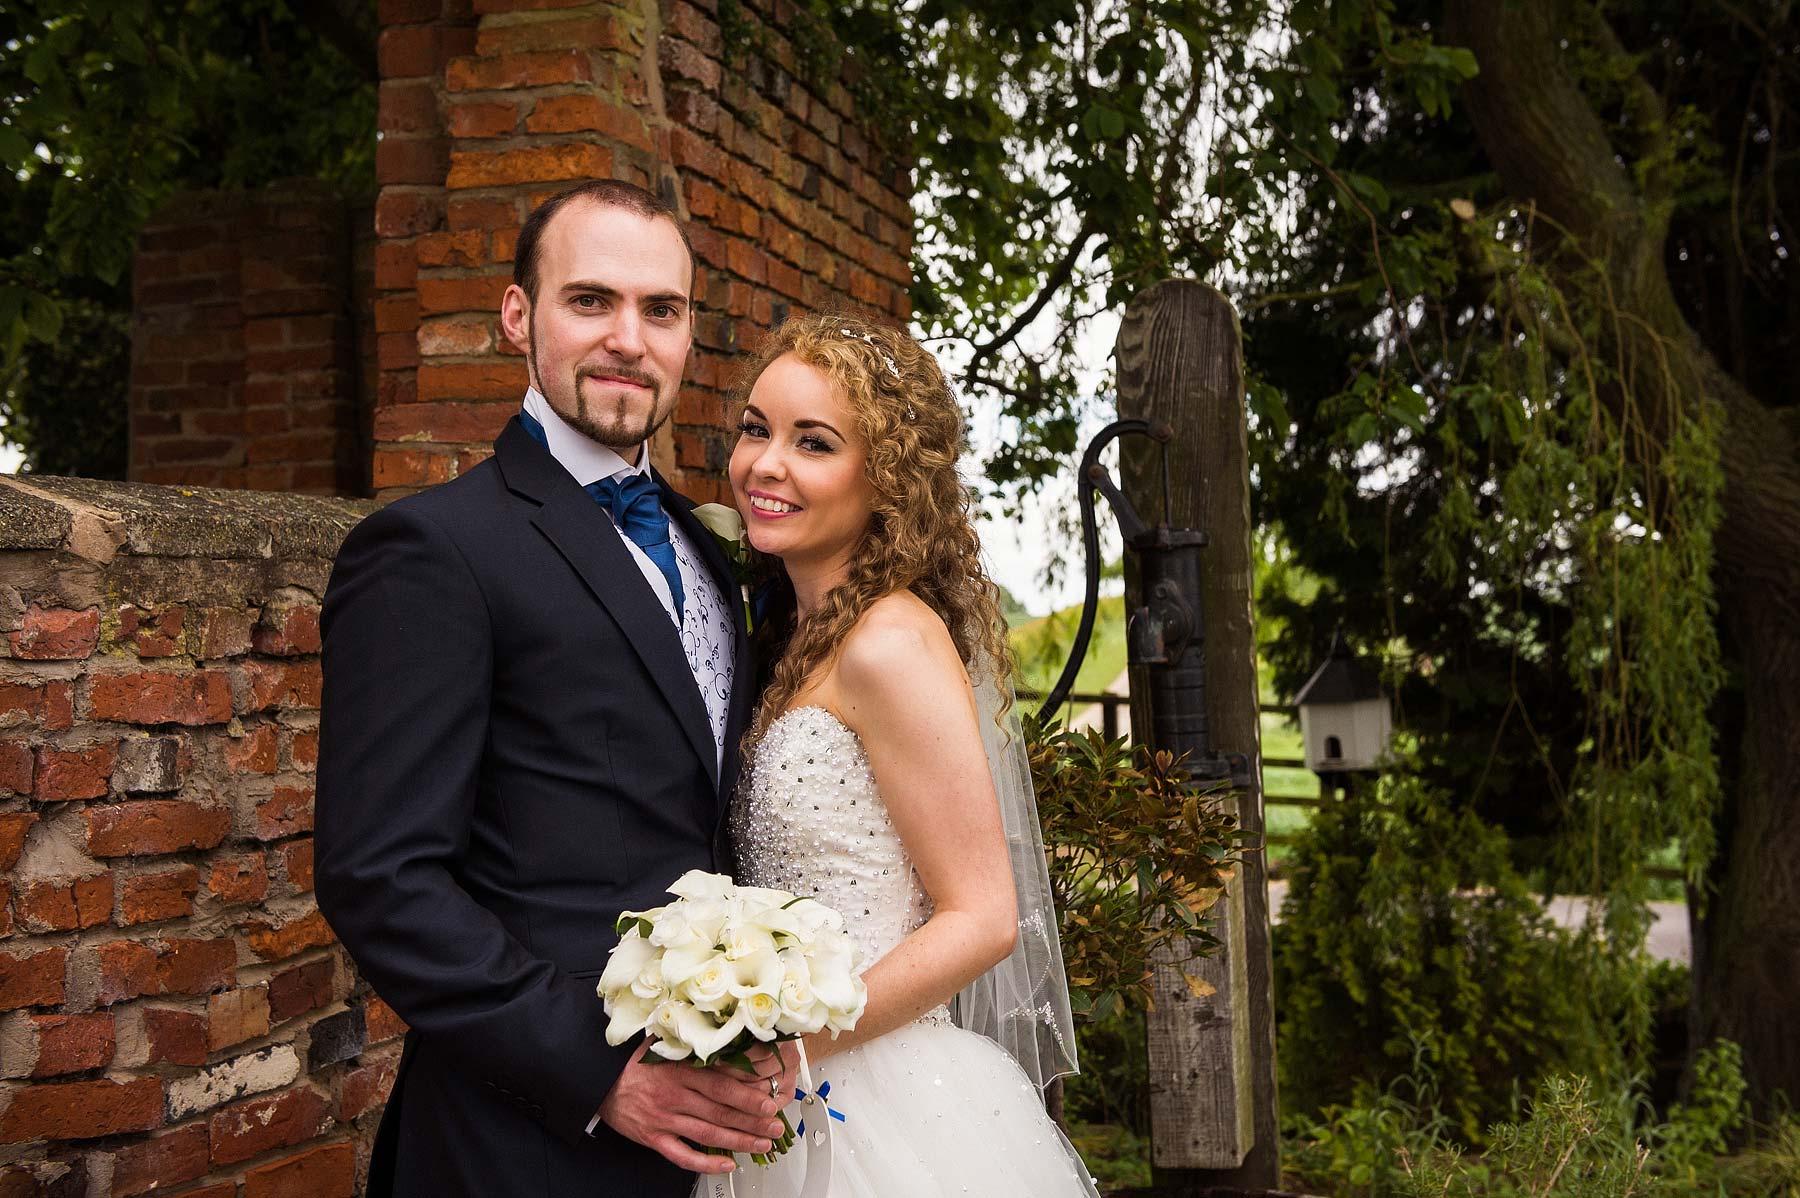 albright-hussey-manor-wedding-photographers-050